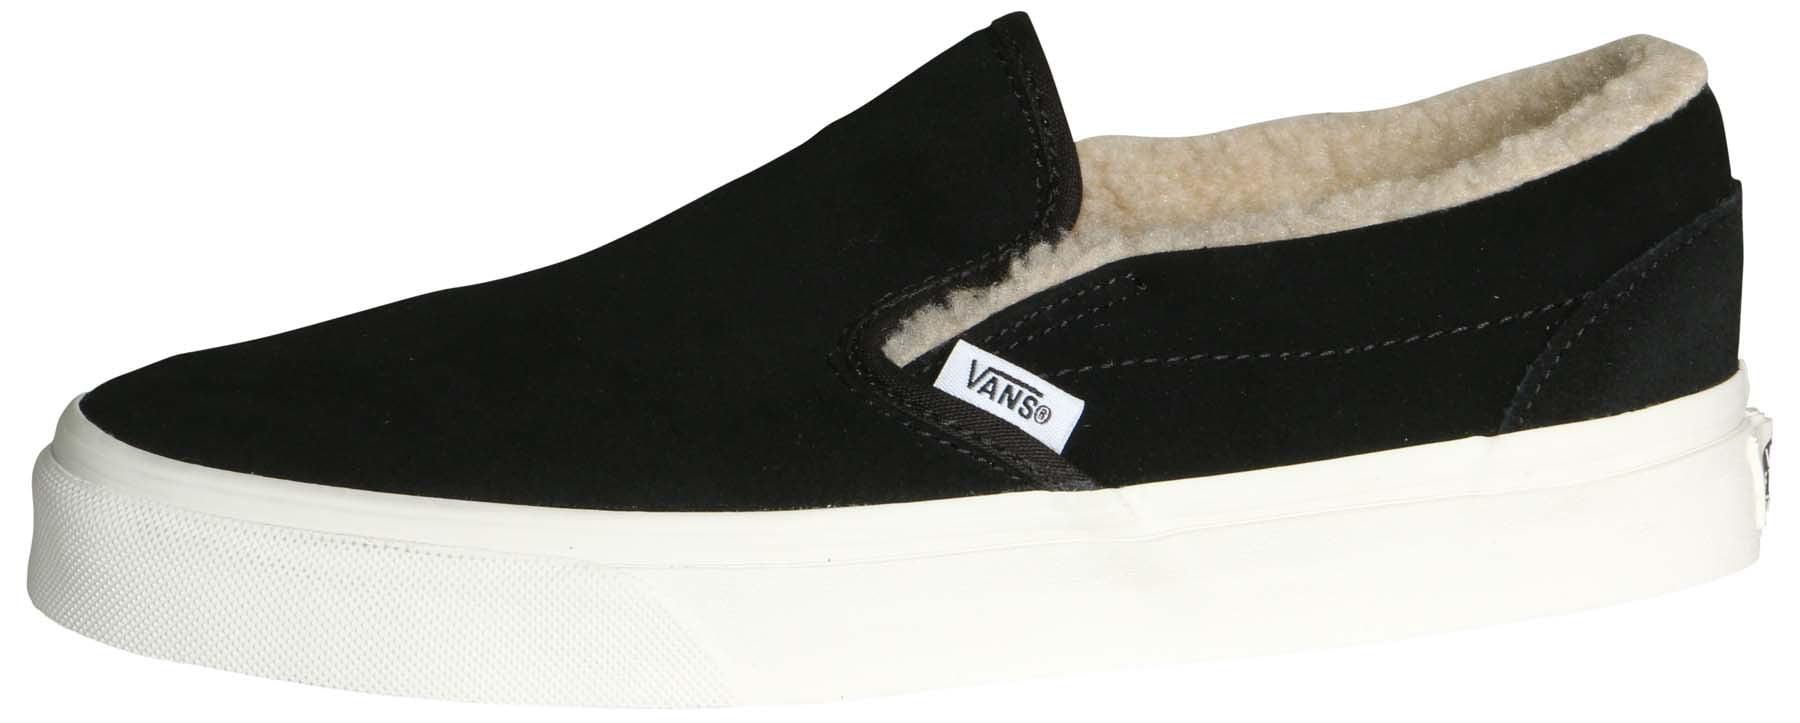 Vans Classic Slip On Suede/Fleece Black/True White Men's Skate Shoes Size 11.5